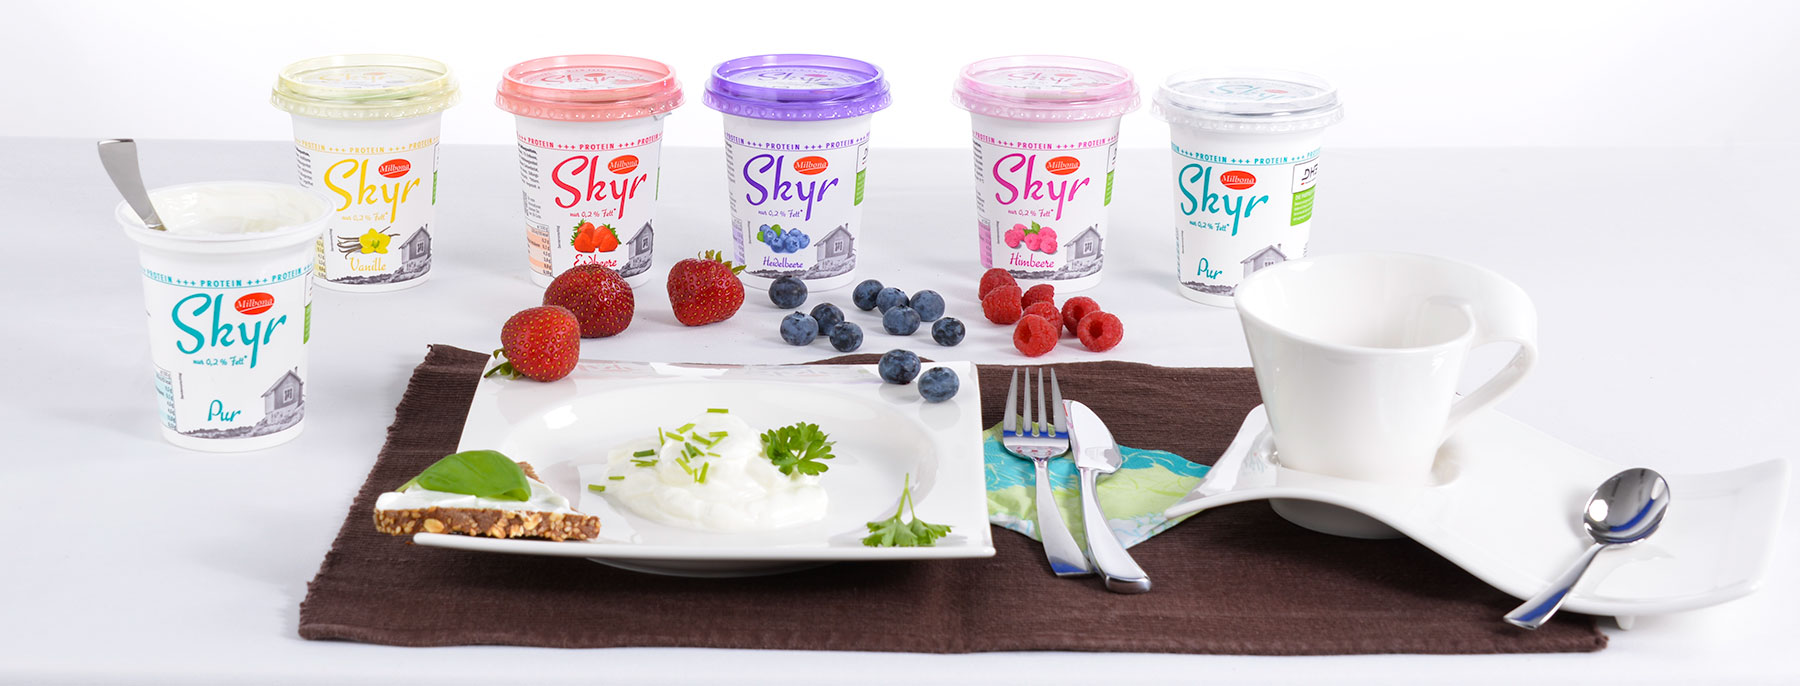 Food Fotografie Joghurt/Skyr, Frucht